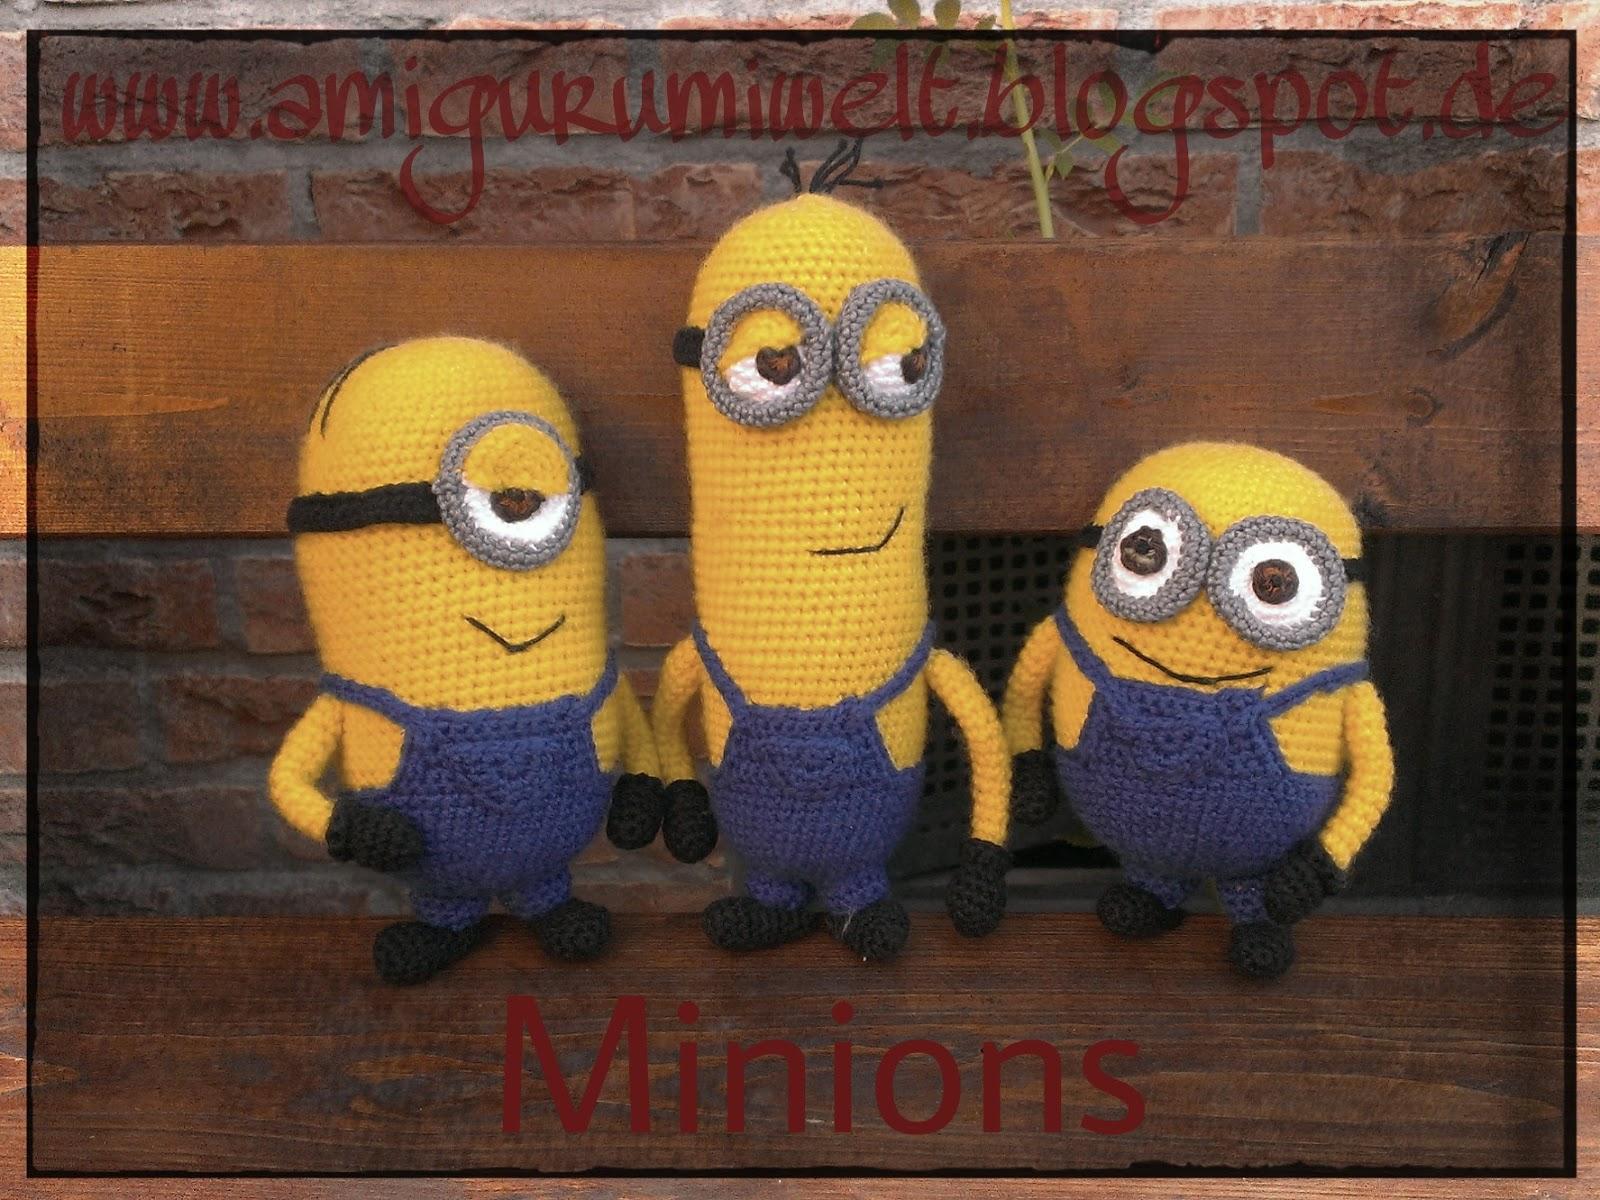 Wundervolle Amigurumi Welt Die Minions Kommen